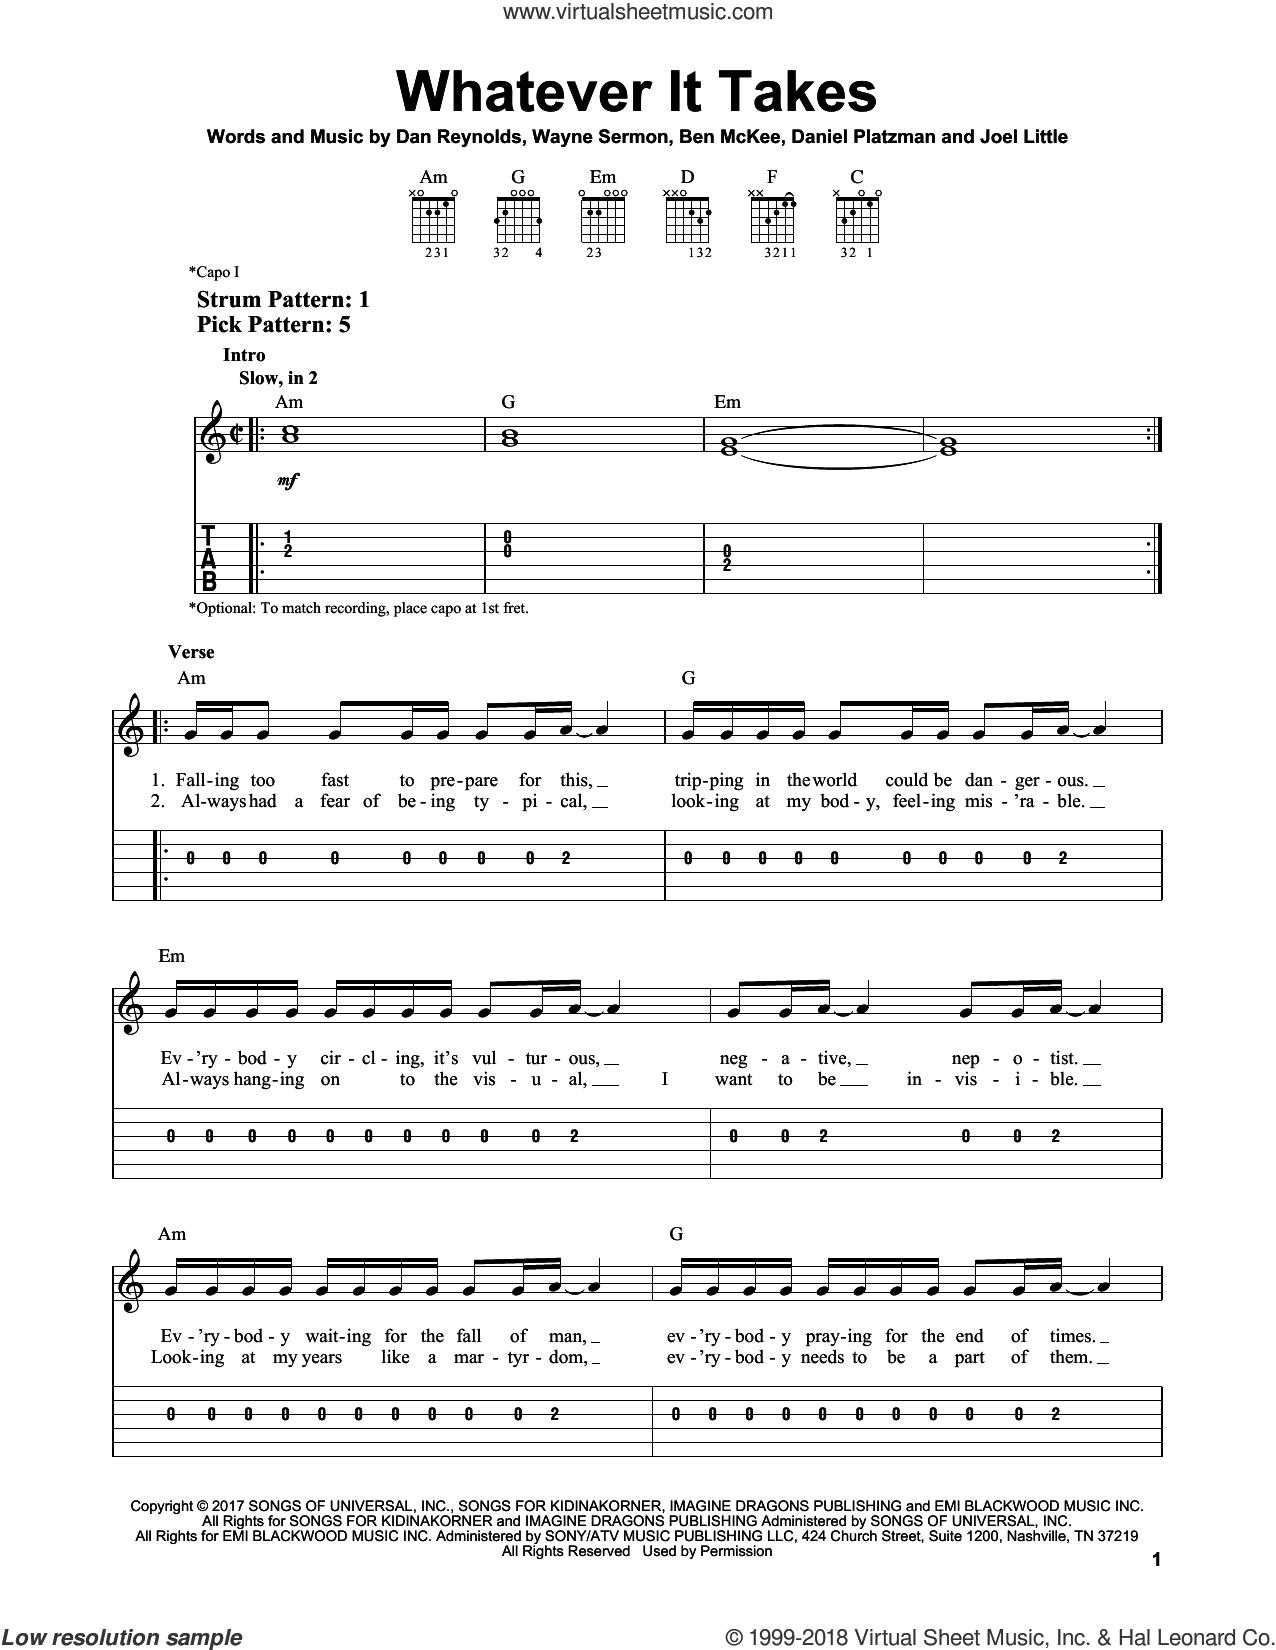 Whatever It Takes sheet music for guitar solo (easy tablature) by Imagine Dragons, Ben McKee, Dan Reynolds, Daniel Platzman, Joel Little and Wayne Sermon, easy guitar (easy tablature)